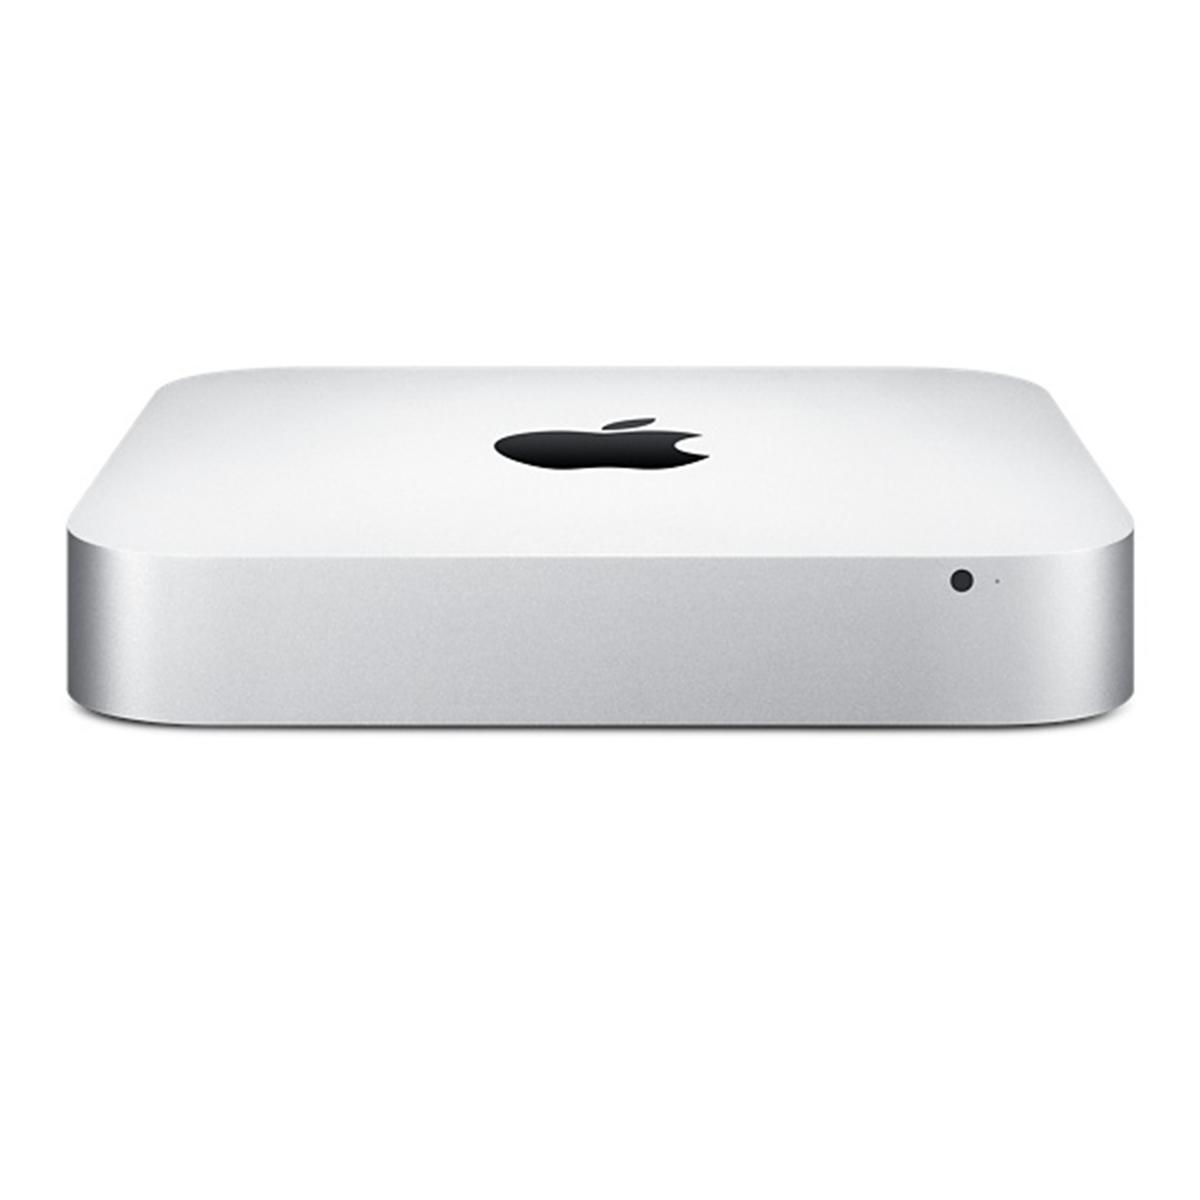 Mac Mini i5 2.6Ghz 16GB 512GB SSD MGEN2LL/A Recertificado